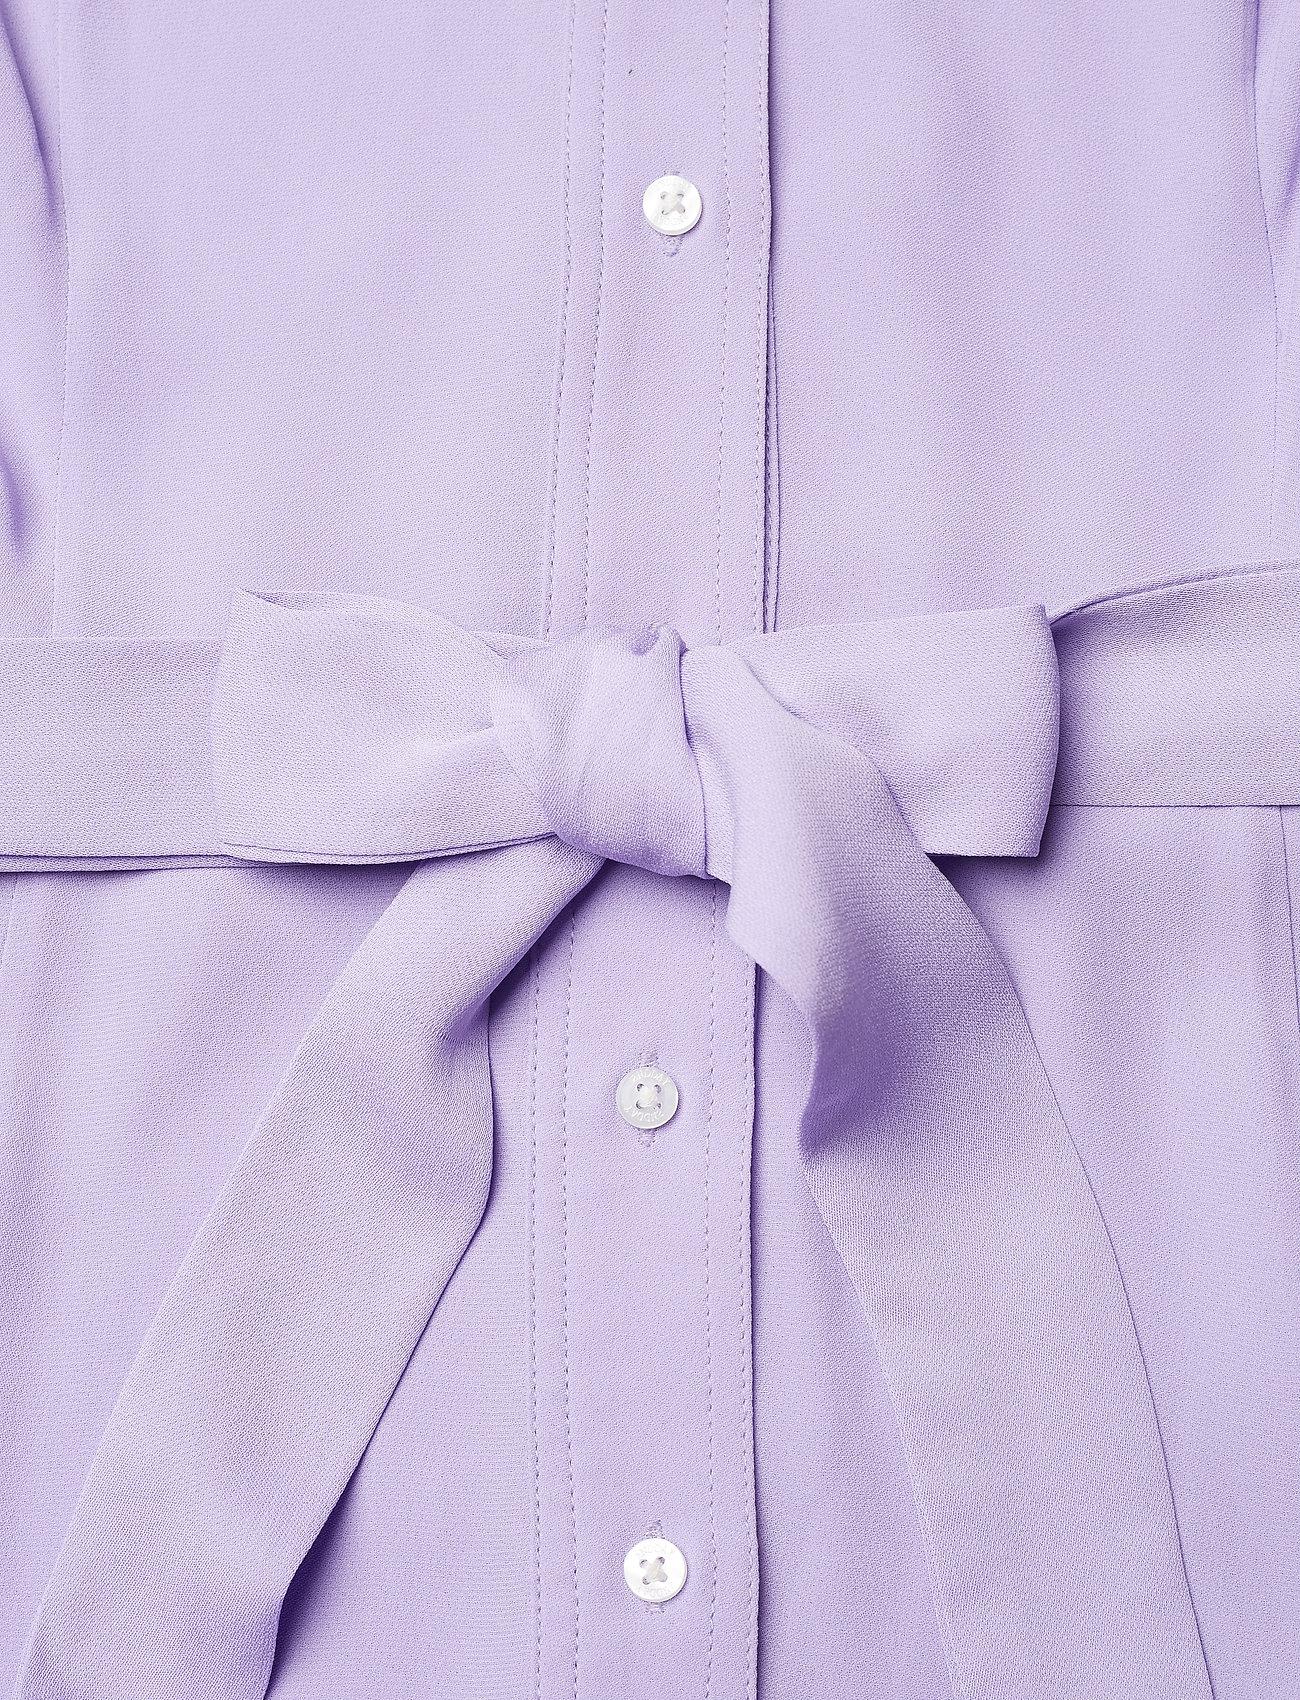 2ndday 2nd Limelight - Robes Cayenne